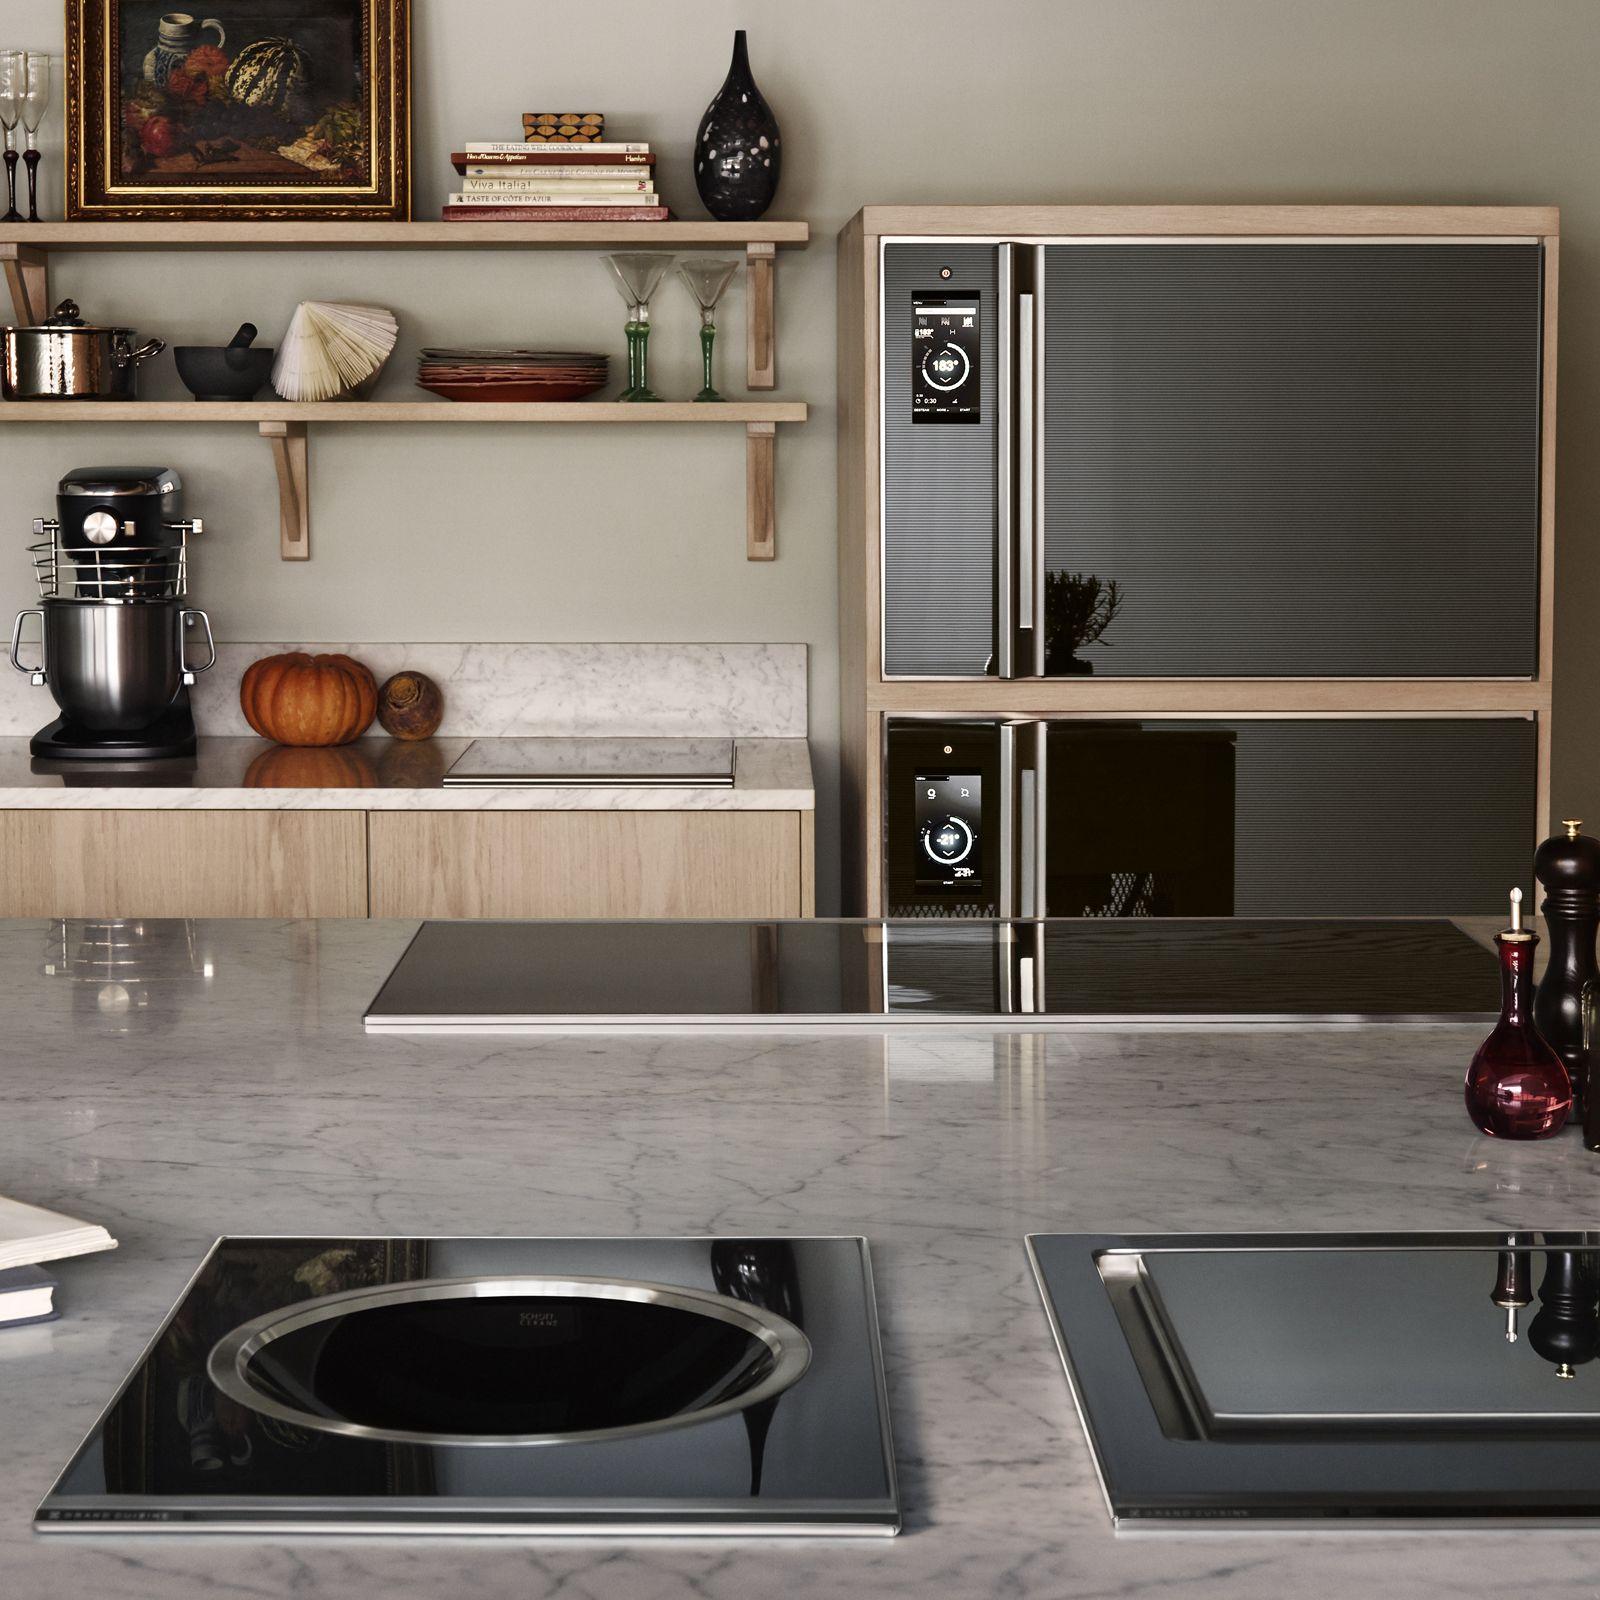 electrolux grand cuisine grandcuisine grand cuisine homes electrolux grand cuisine grandcuisine kitchen ideastechnology